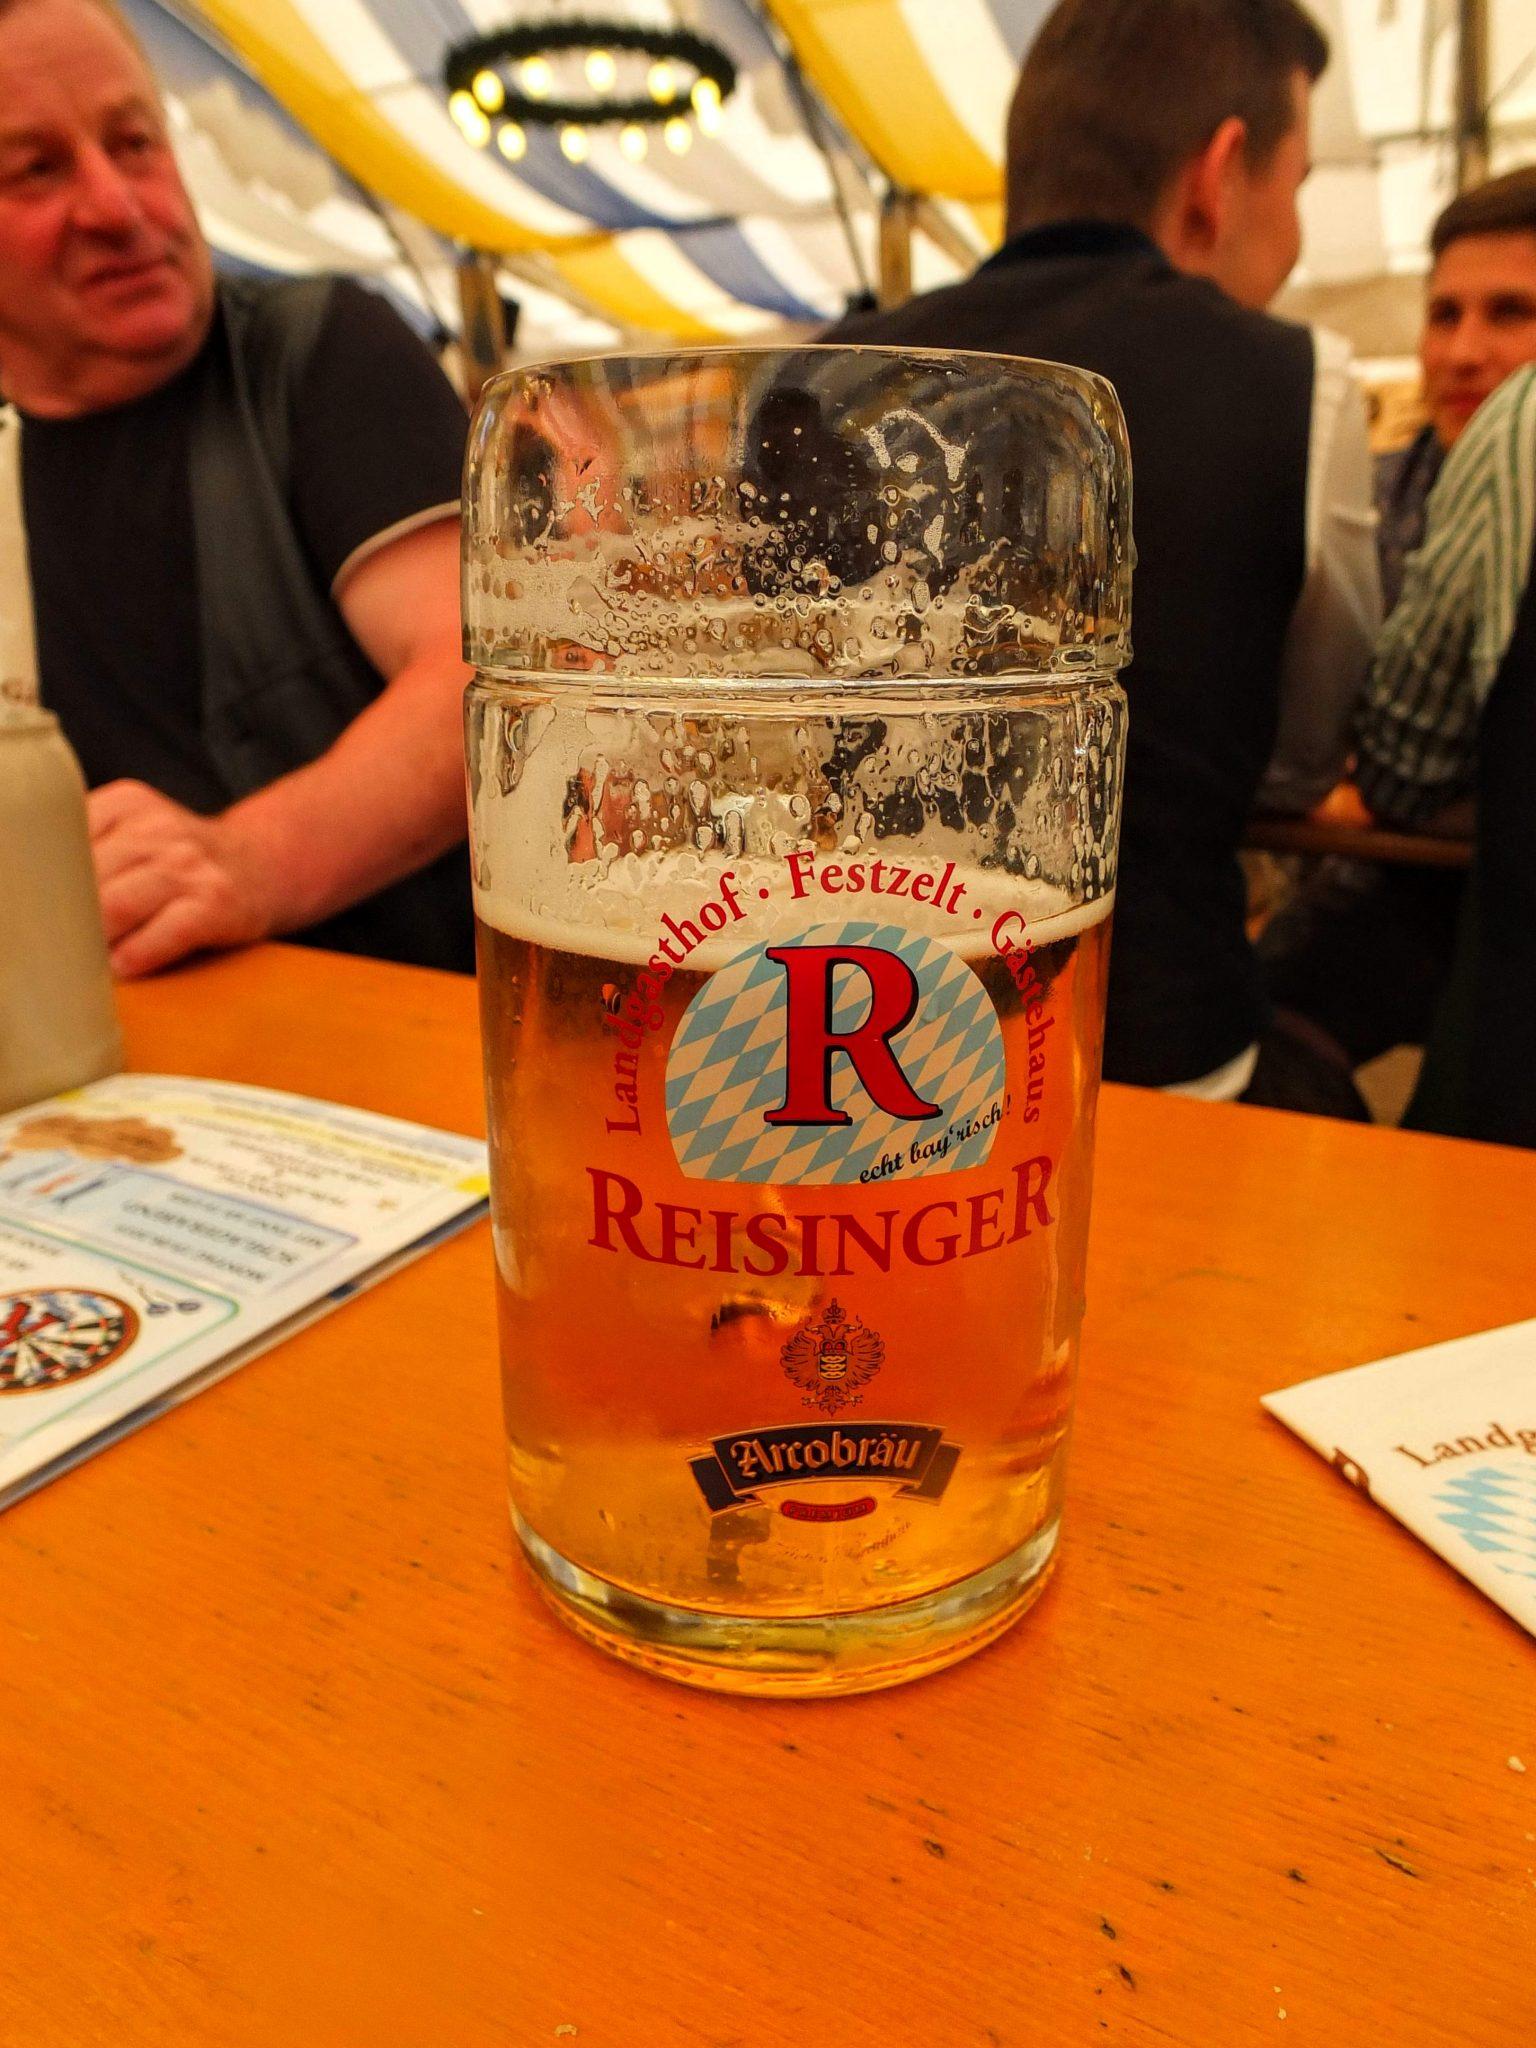 Reisinger Festbier (Arcobrau)